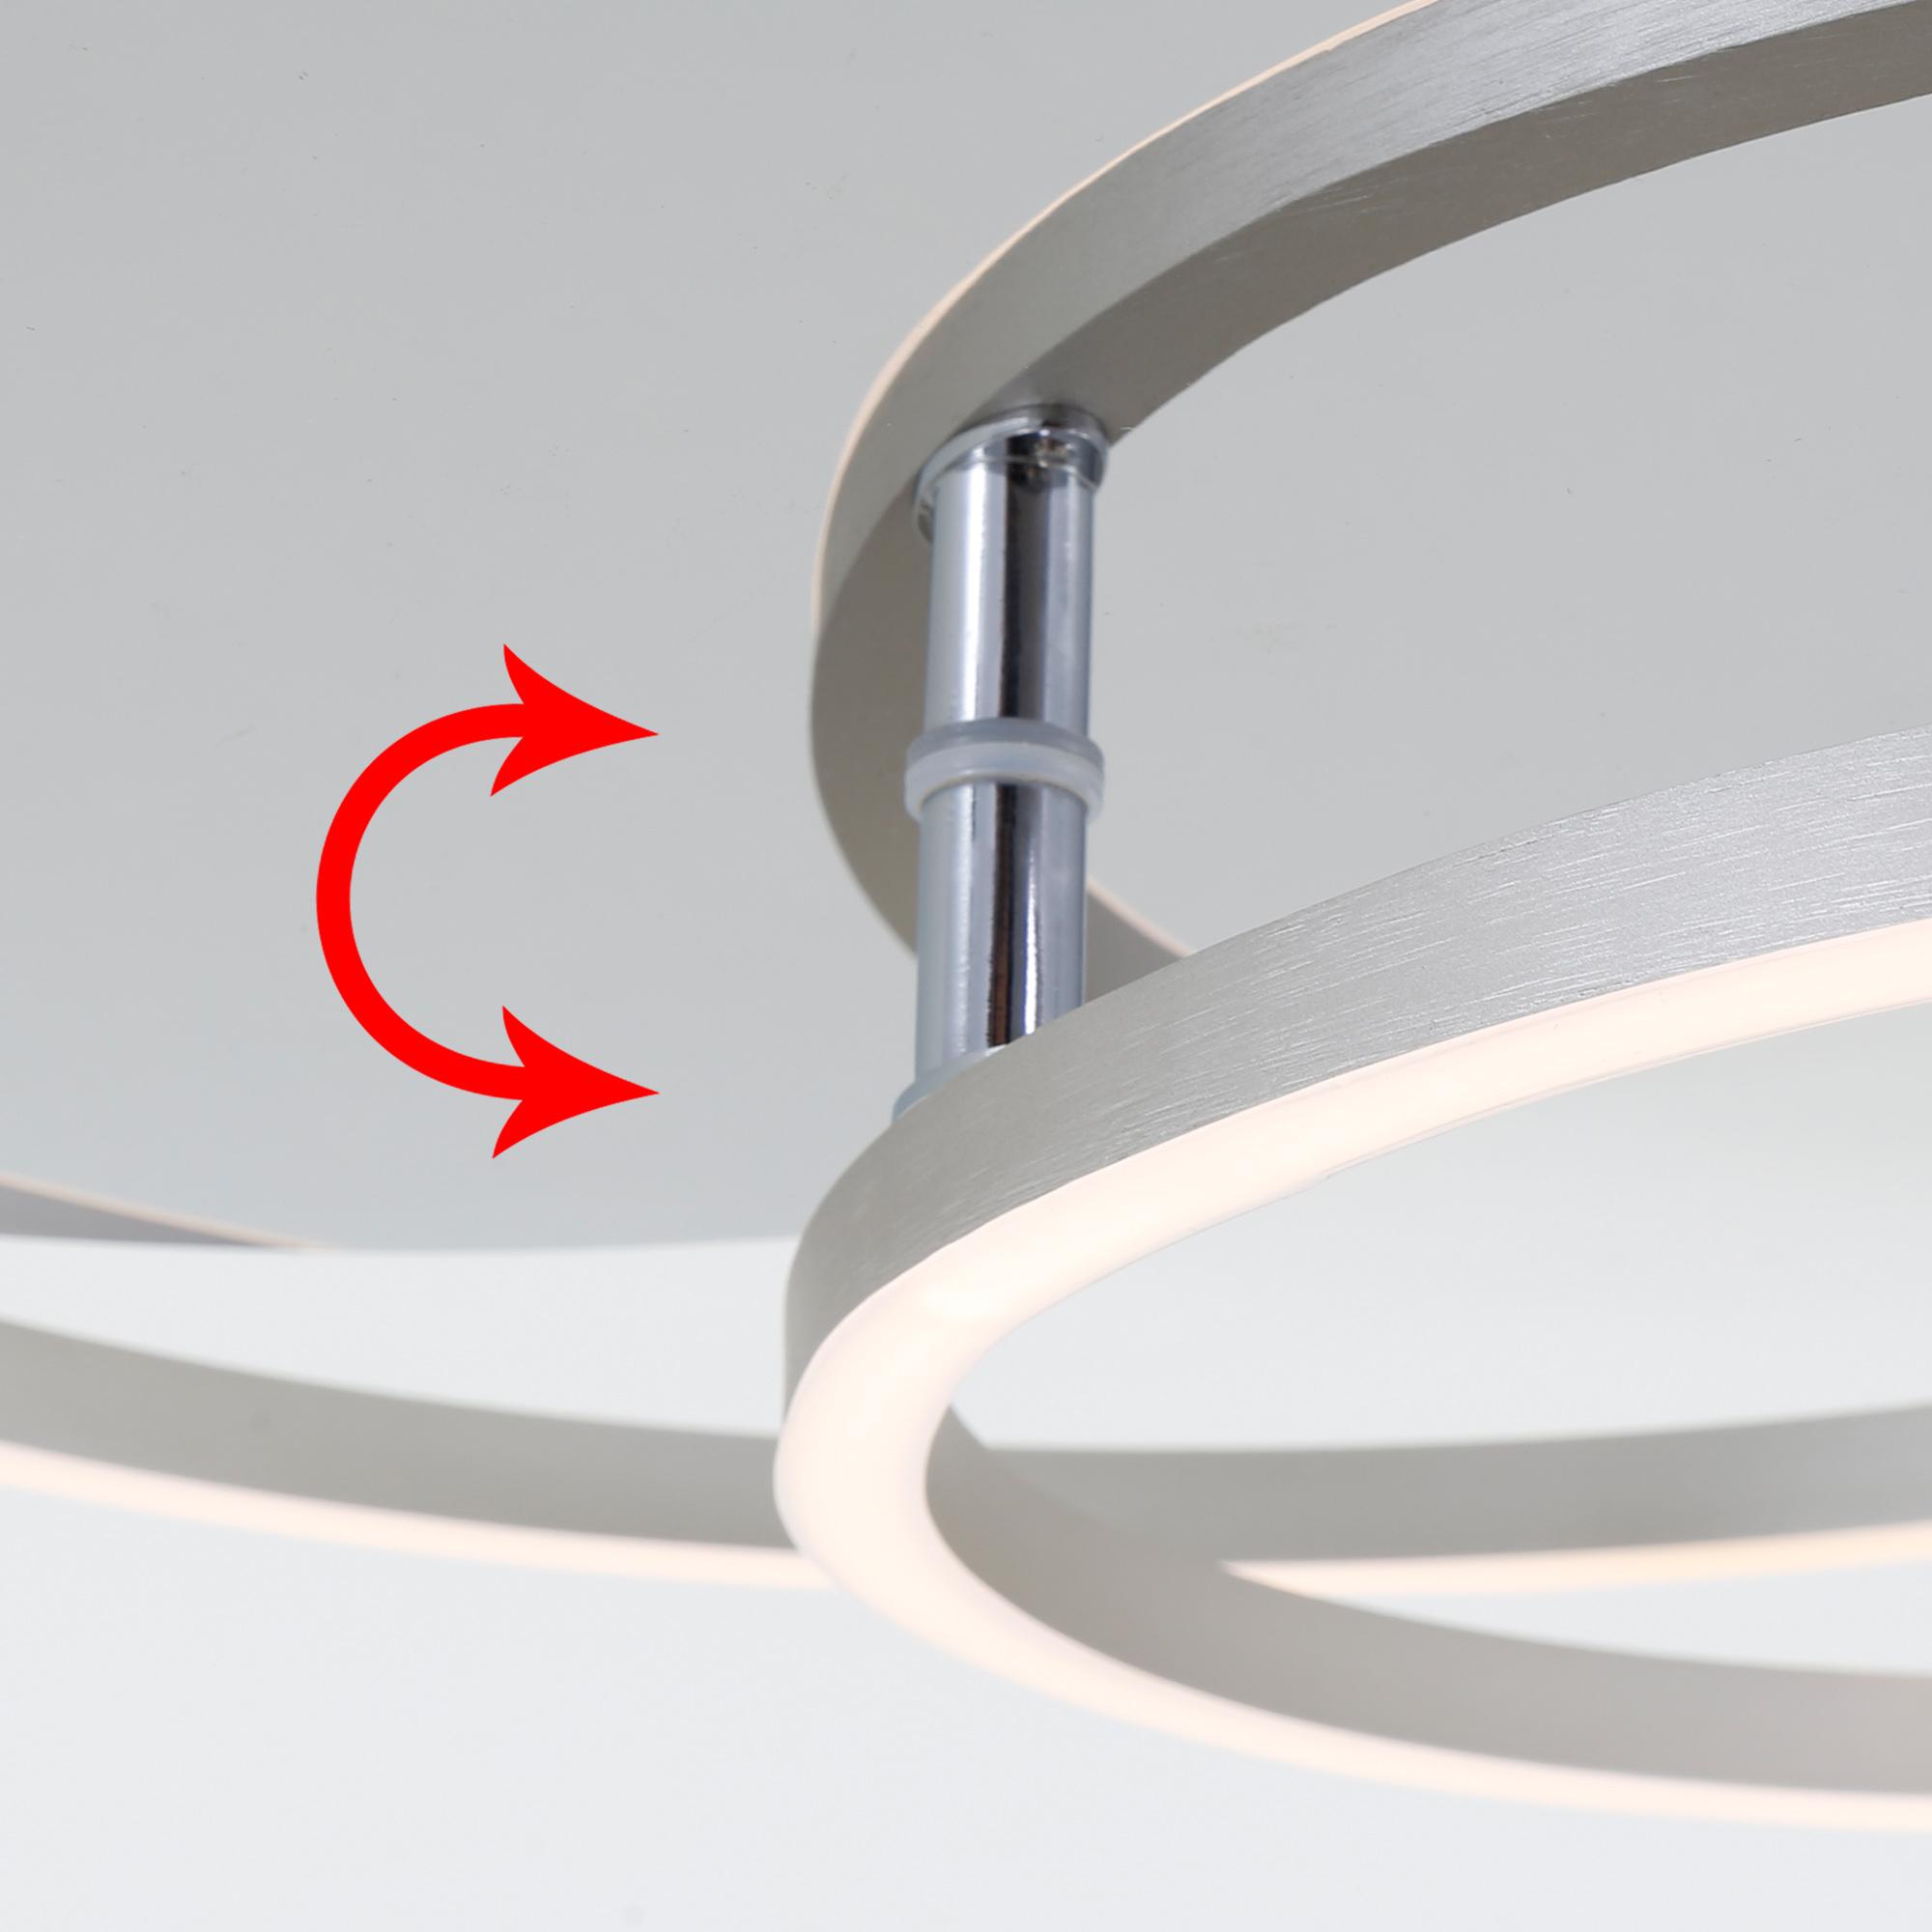 LED Deckenleuchte Alu-Chrom